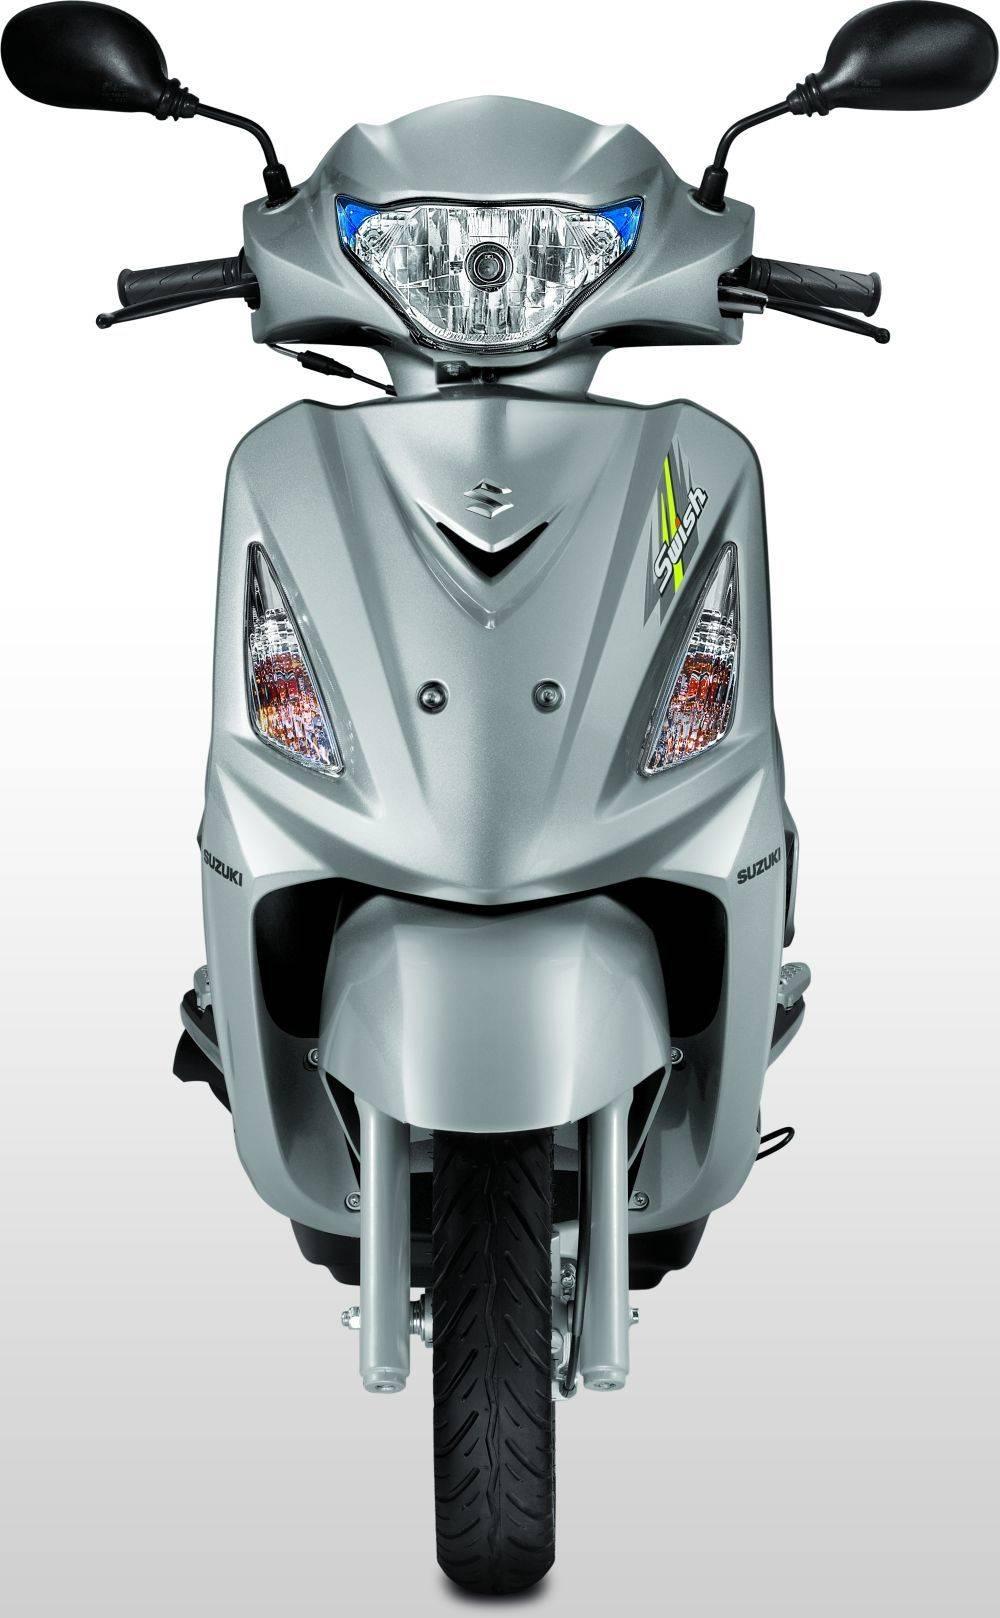 Auto Center Front Royal >> Suzuki Swish 125 Price, Mileage, Review - Suzuki Bikes